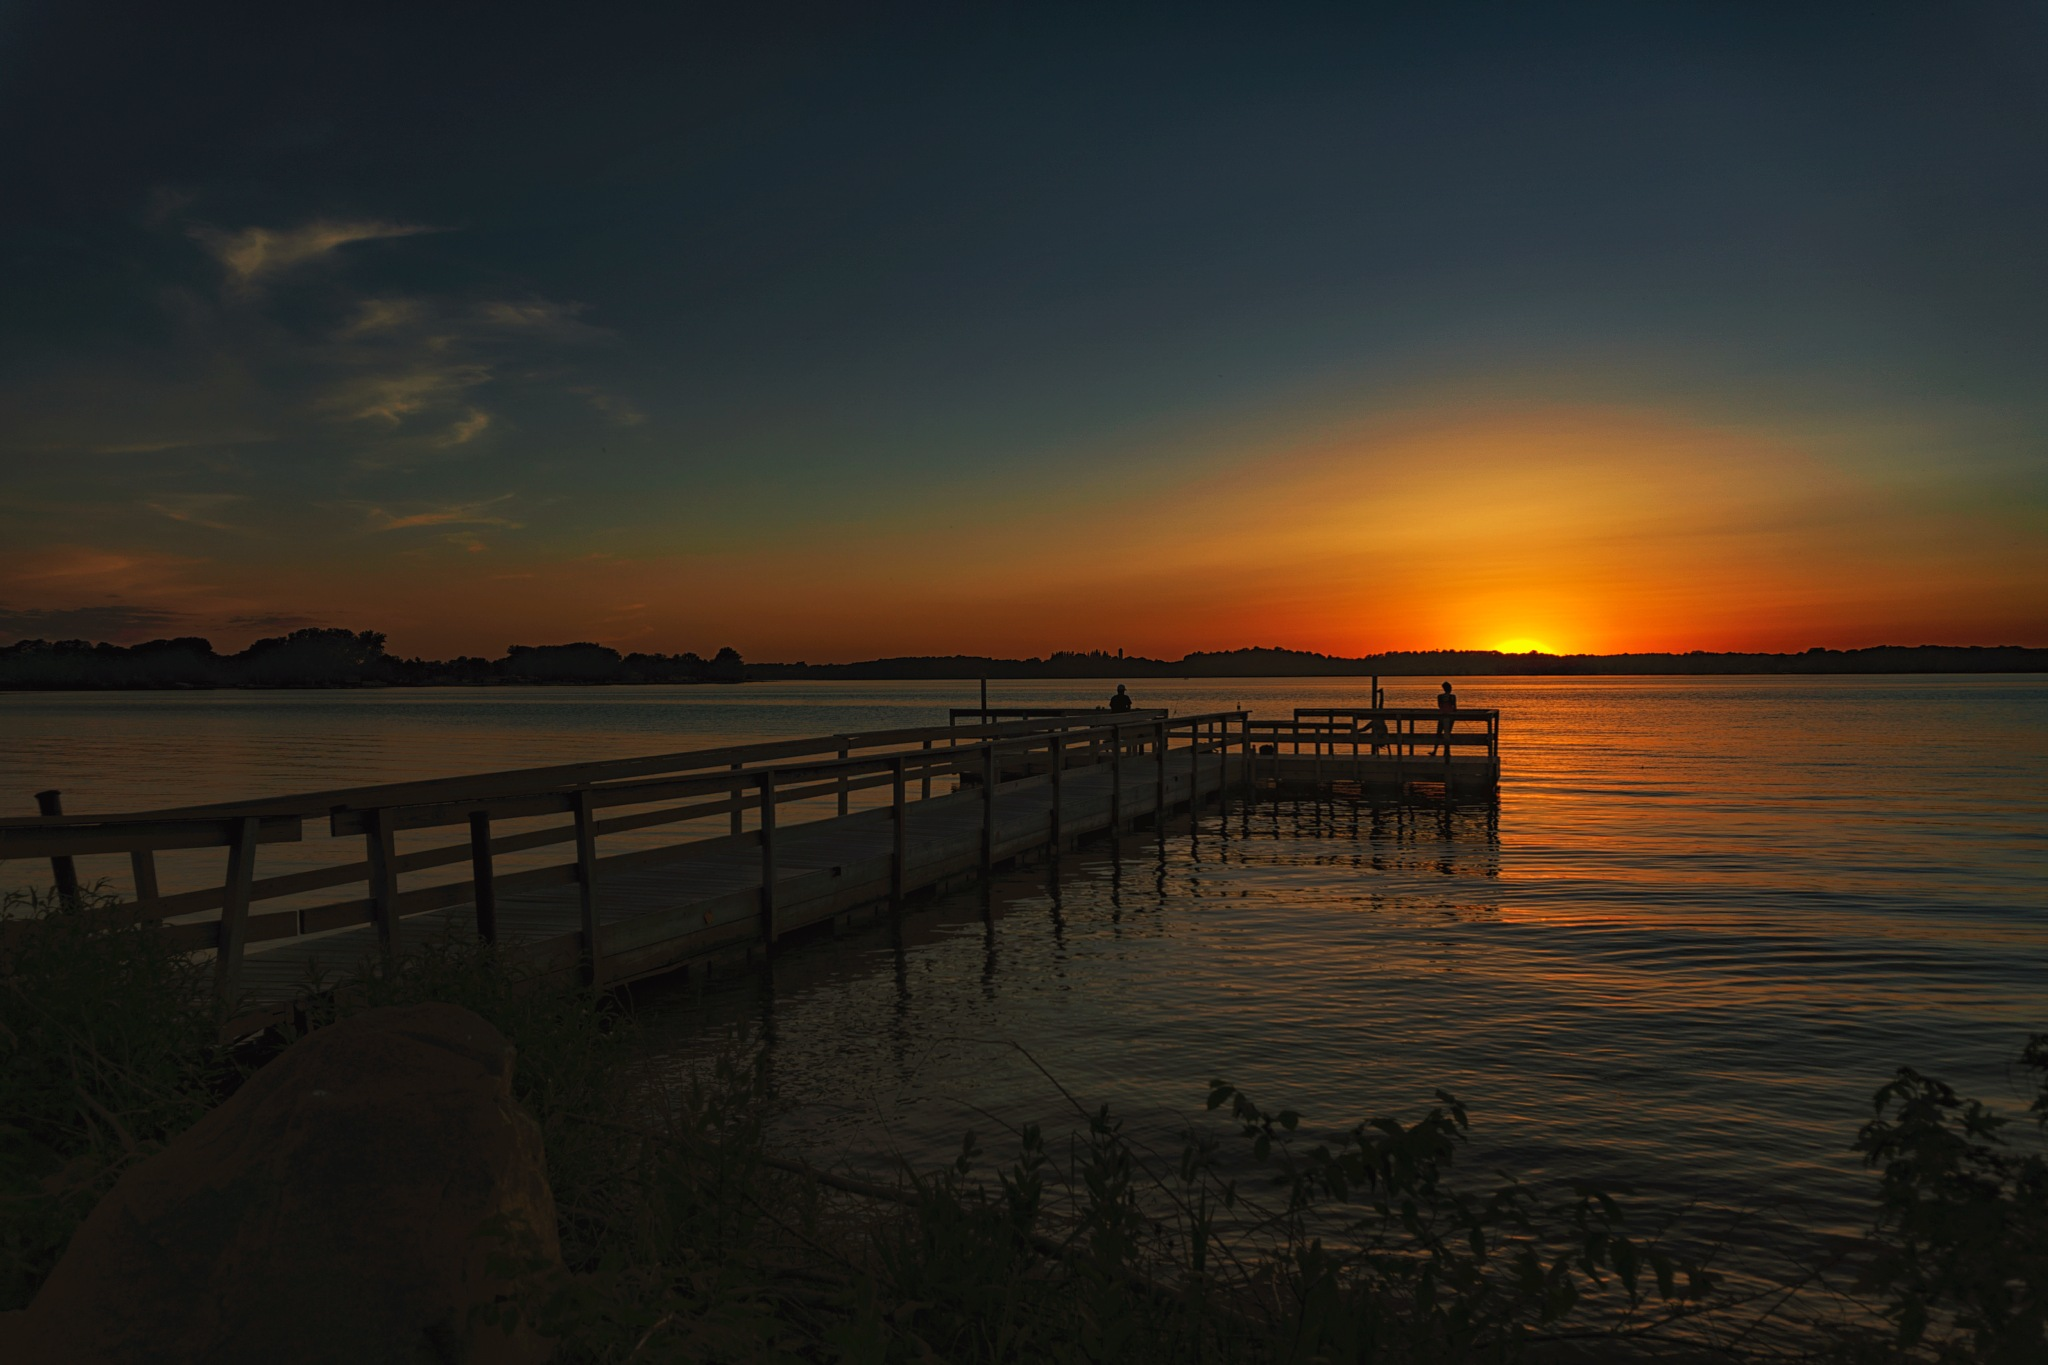 Cartwheels on the dock by Tom Davison